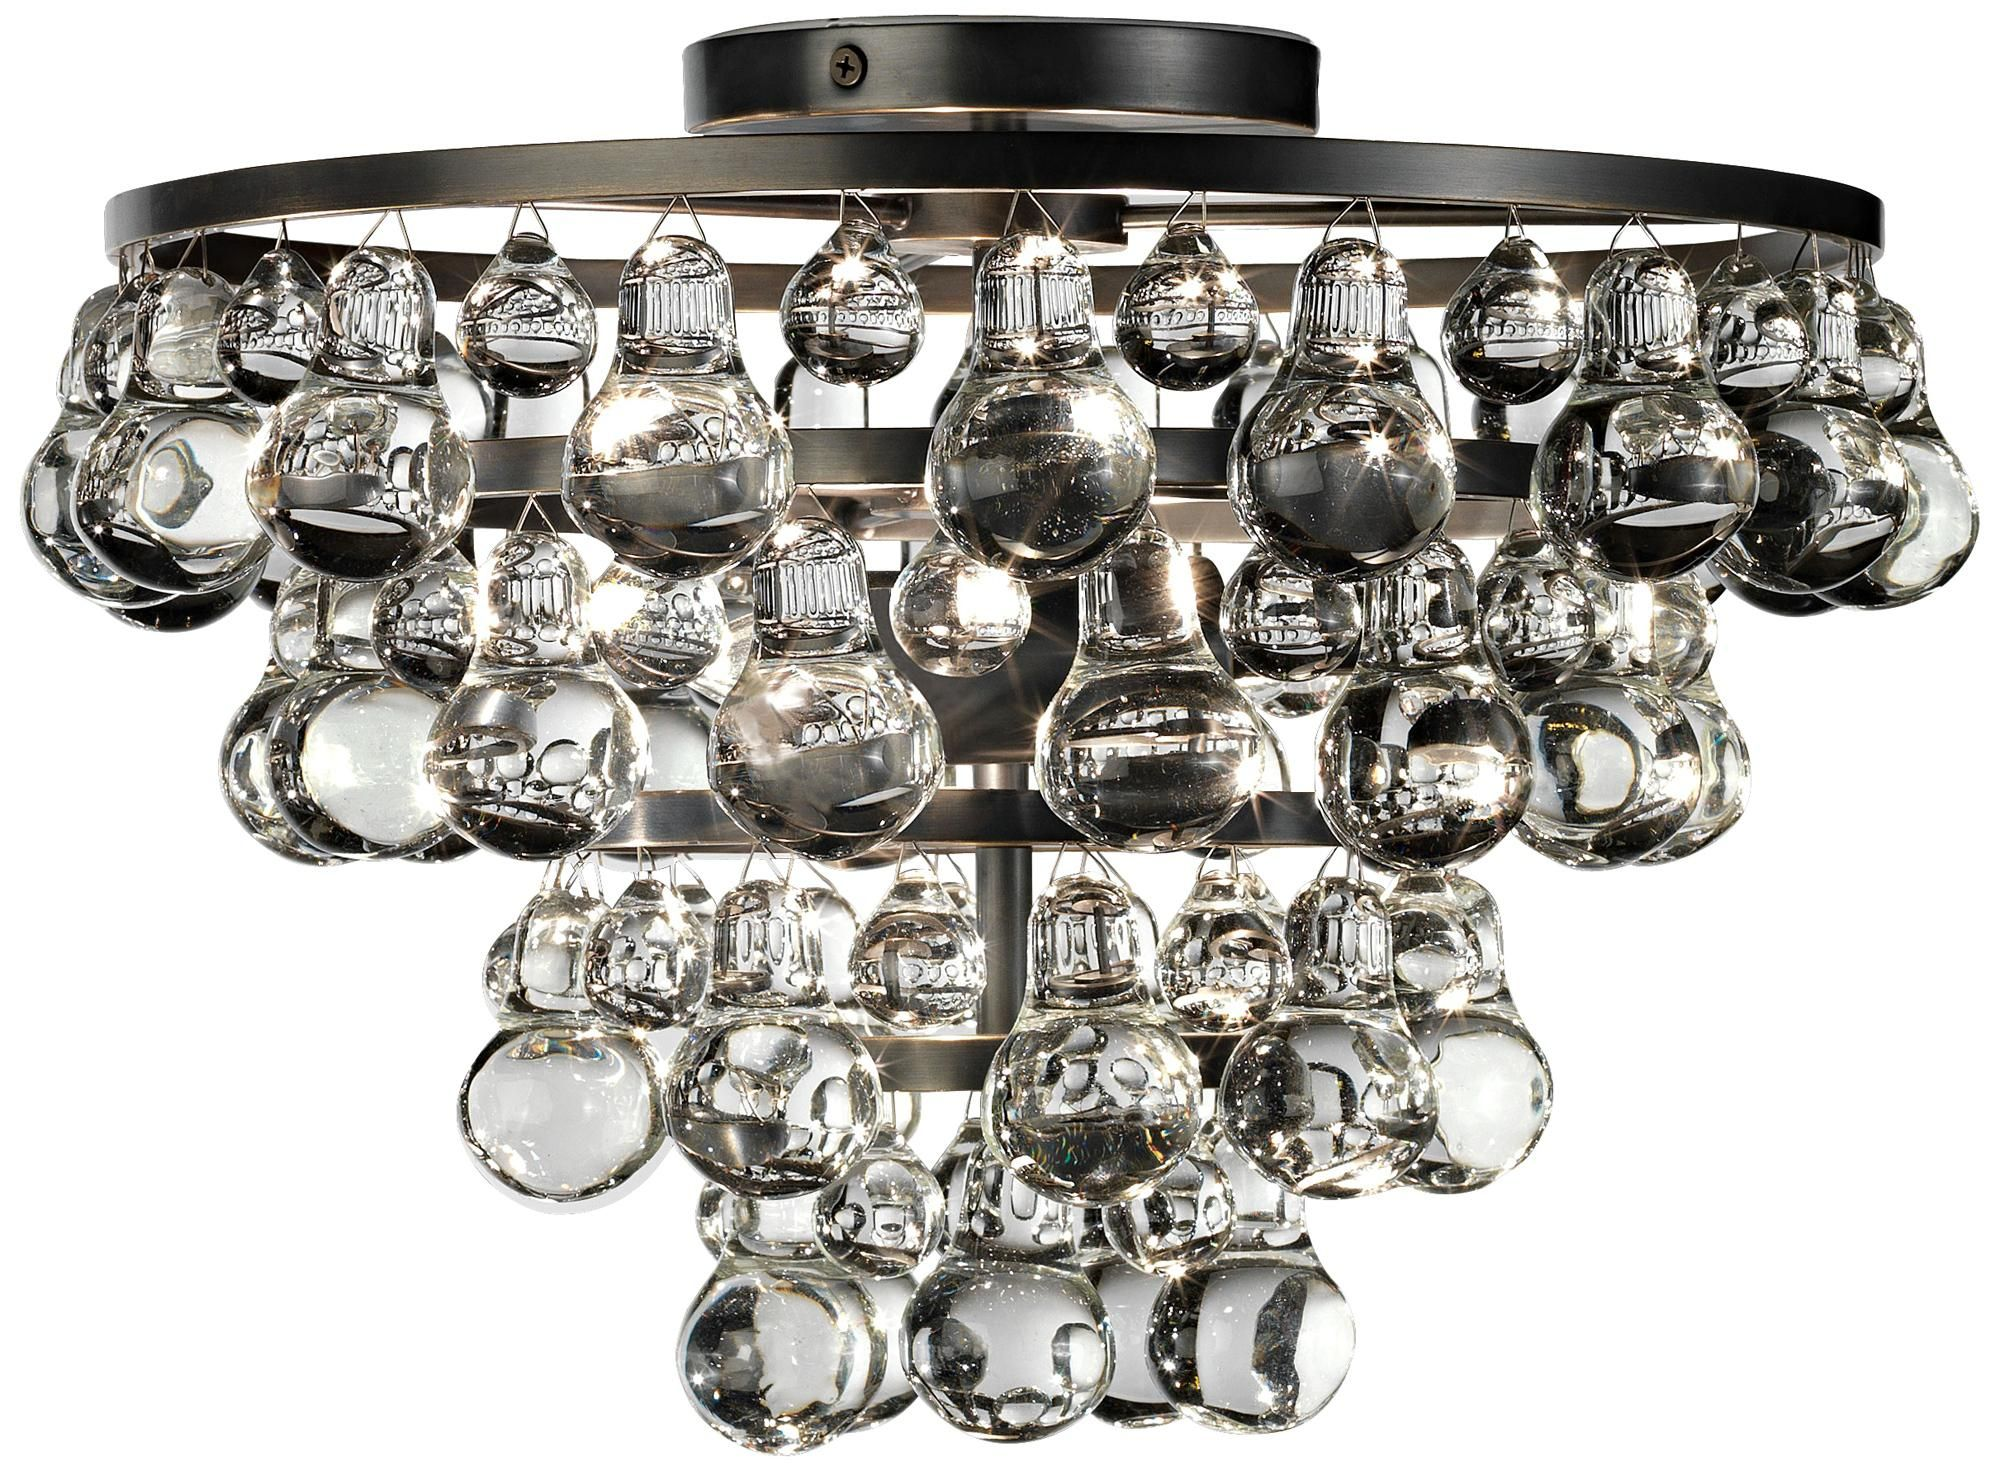 Bling Collection Patina Bronze Flushmount Ceiling Light K4686 Lamps Plus Robert Abbey Bling Bling Ceiling Lights